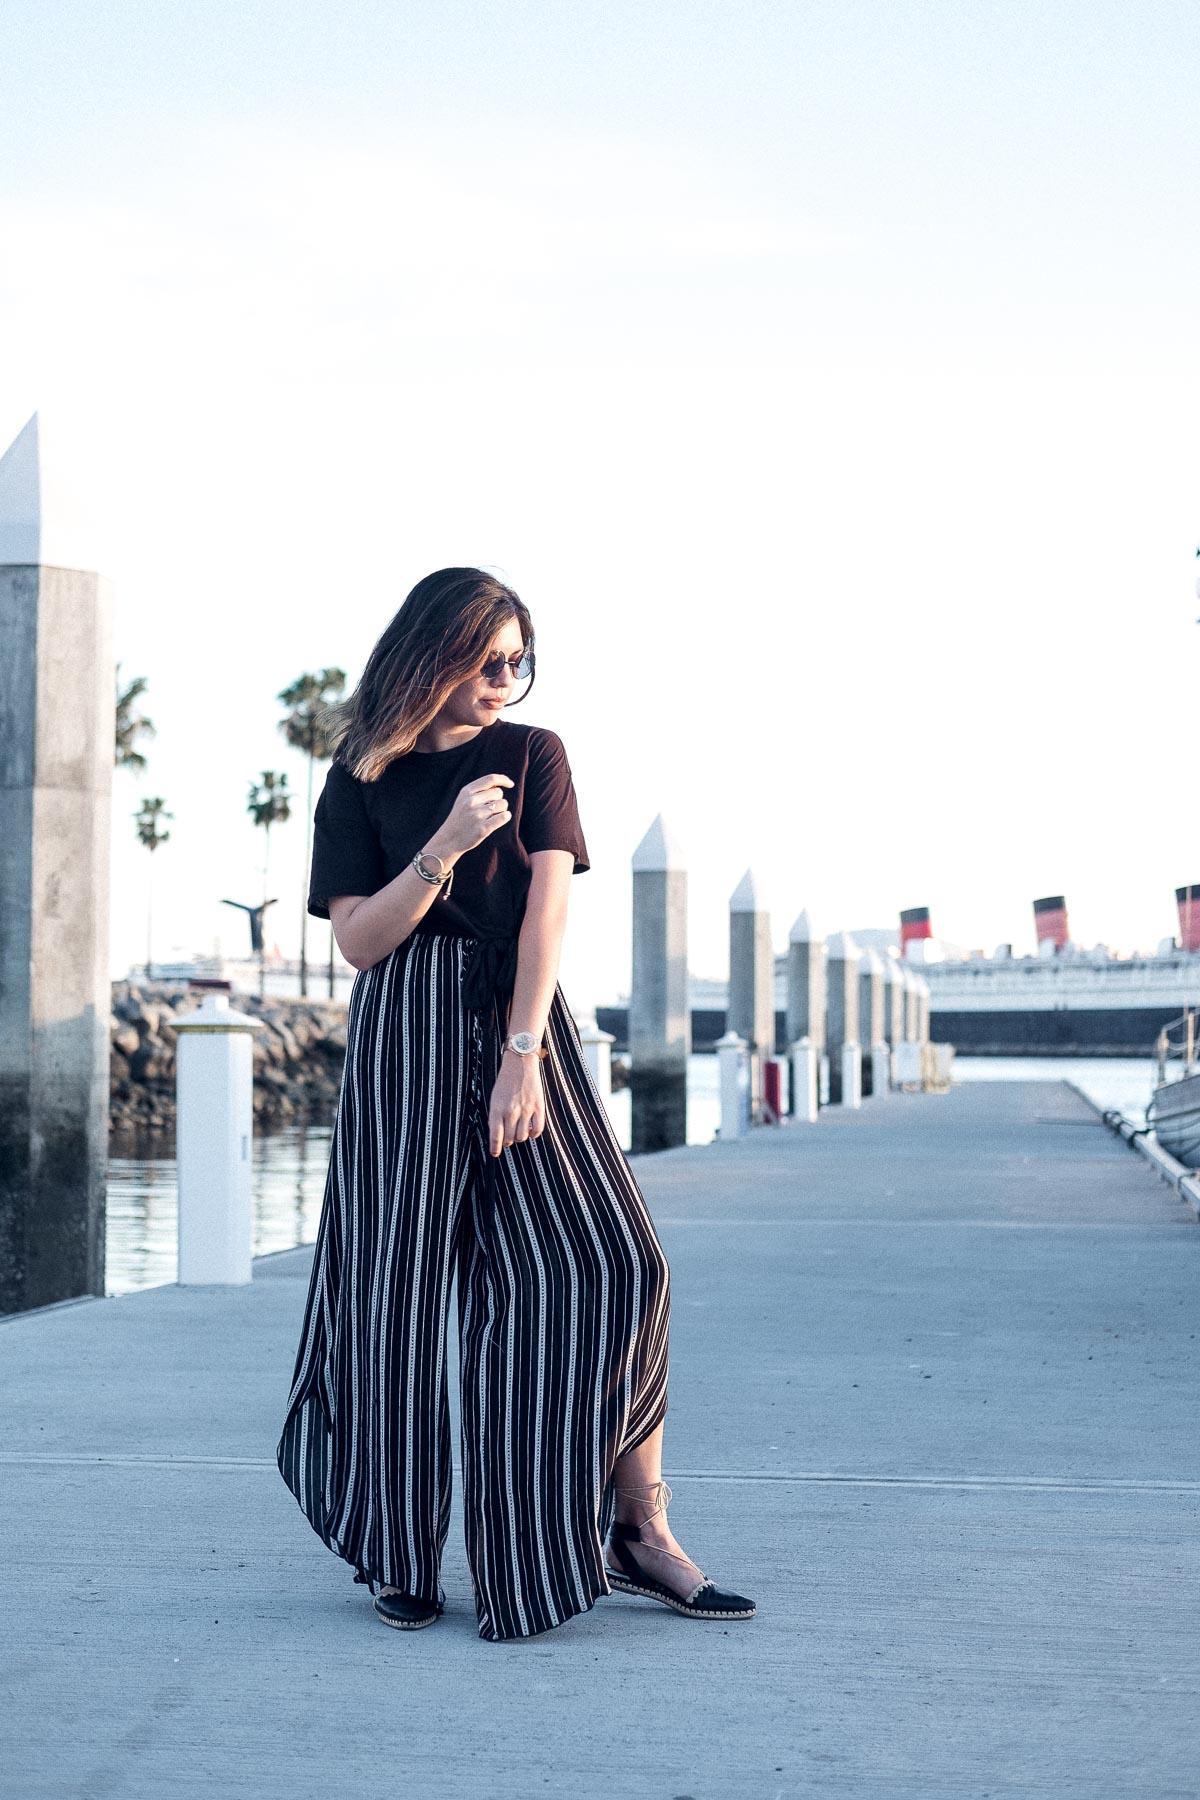 Rachel Off Duty: Wide-Legged Pants and Crop Top